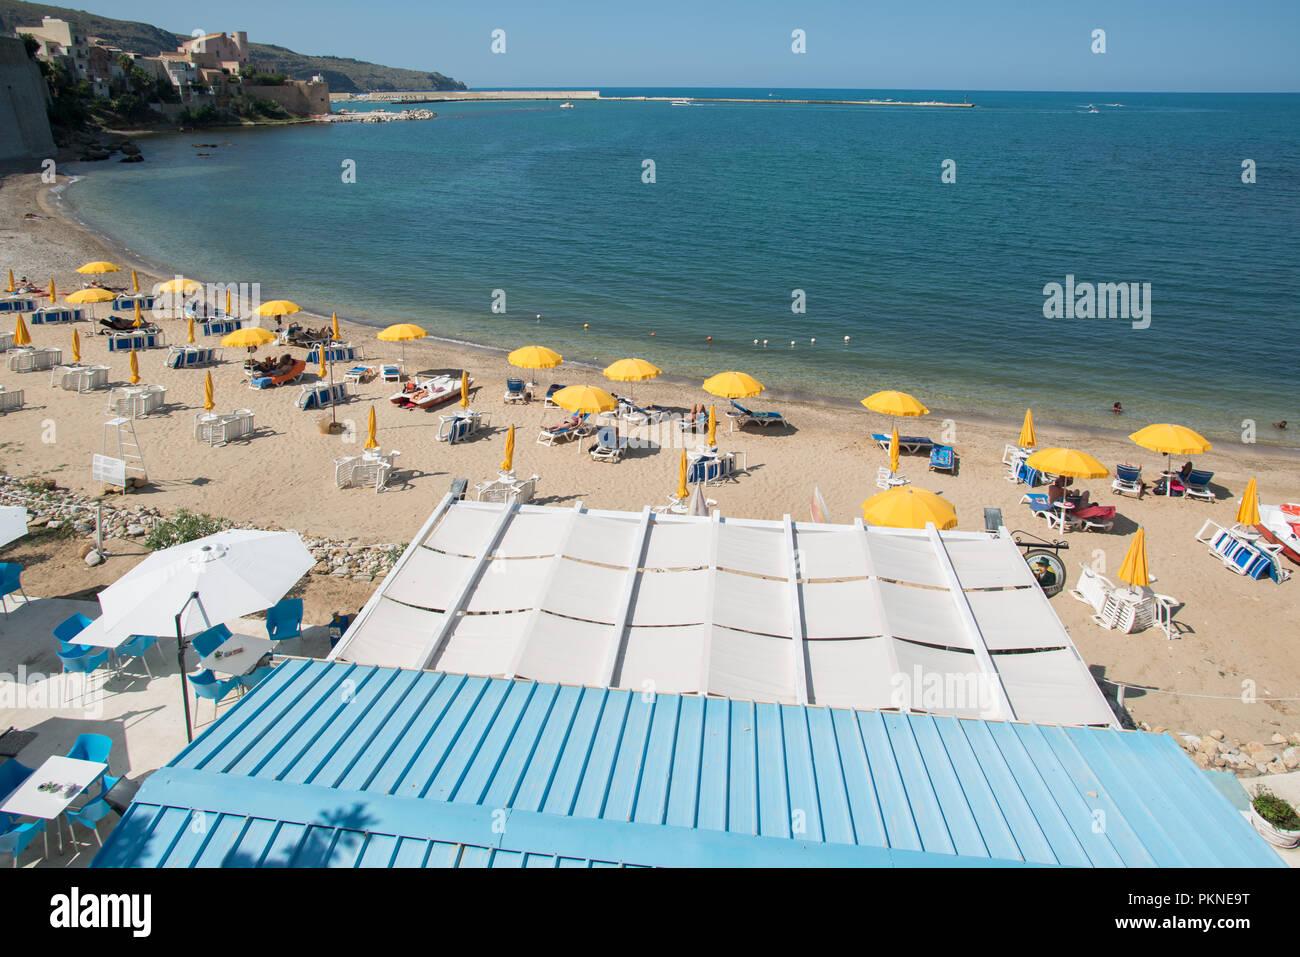 Stadtstrand Castellammare del Golfo Sizilien - Stock Image